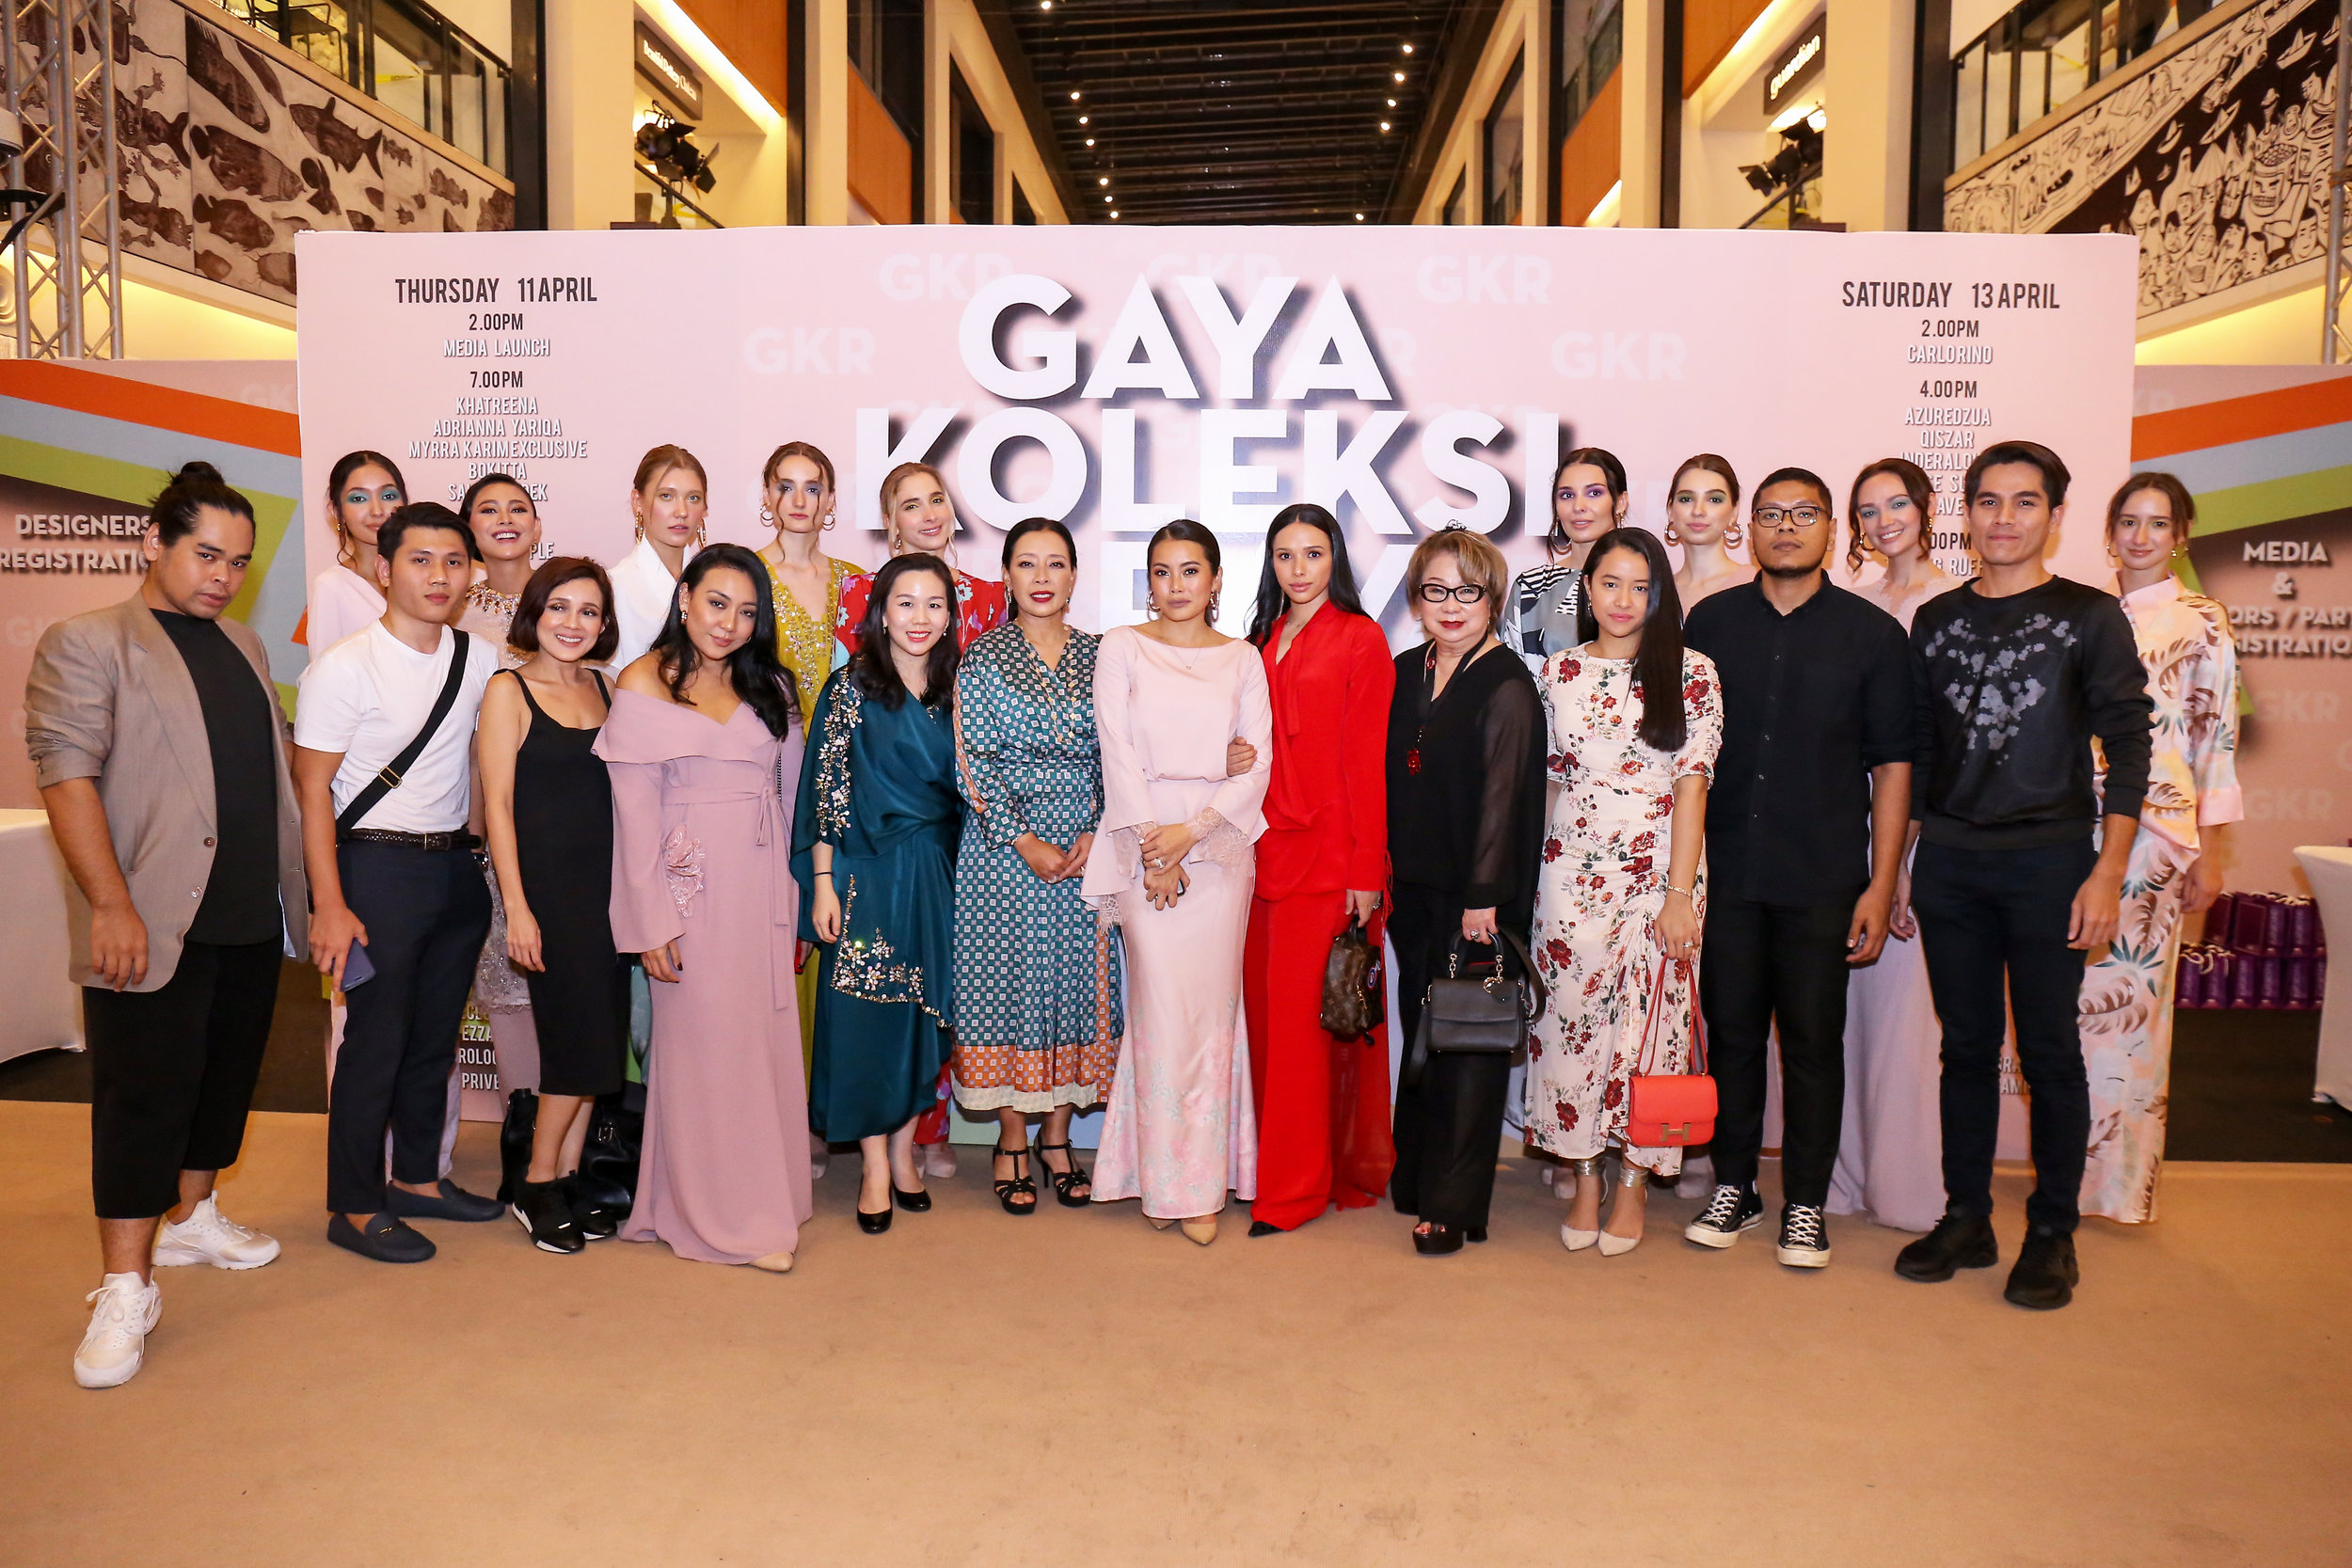 (L-R) : Nurita Harith, Alia Bastaman, Yiu Lin, Afiq M & Petra